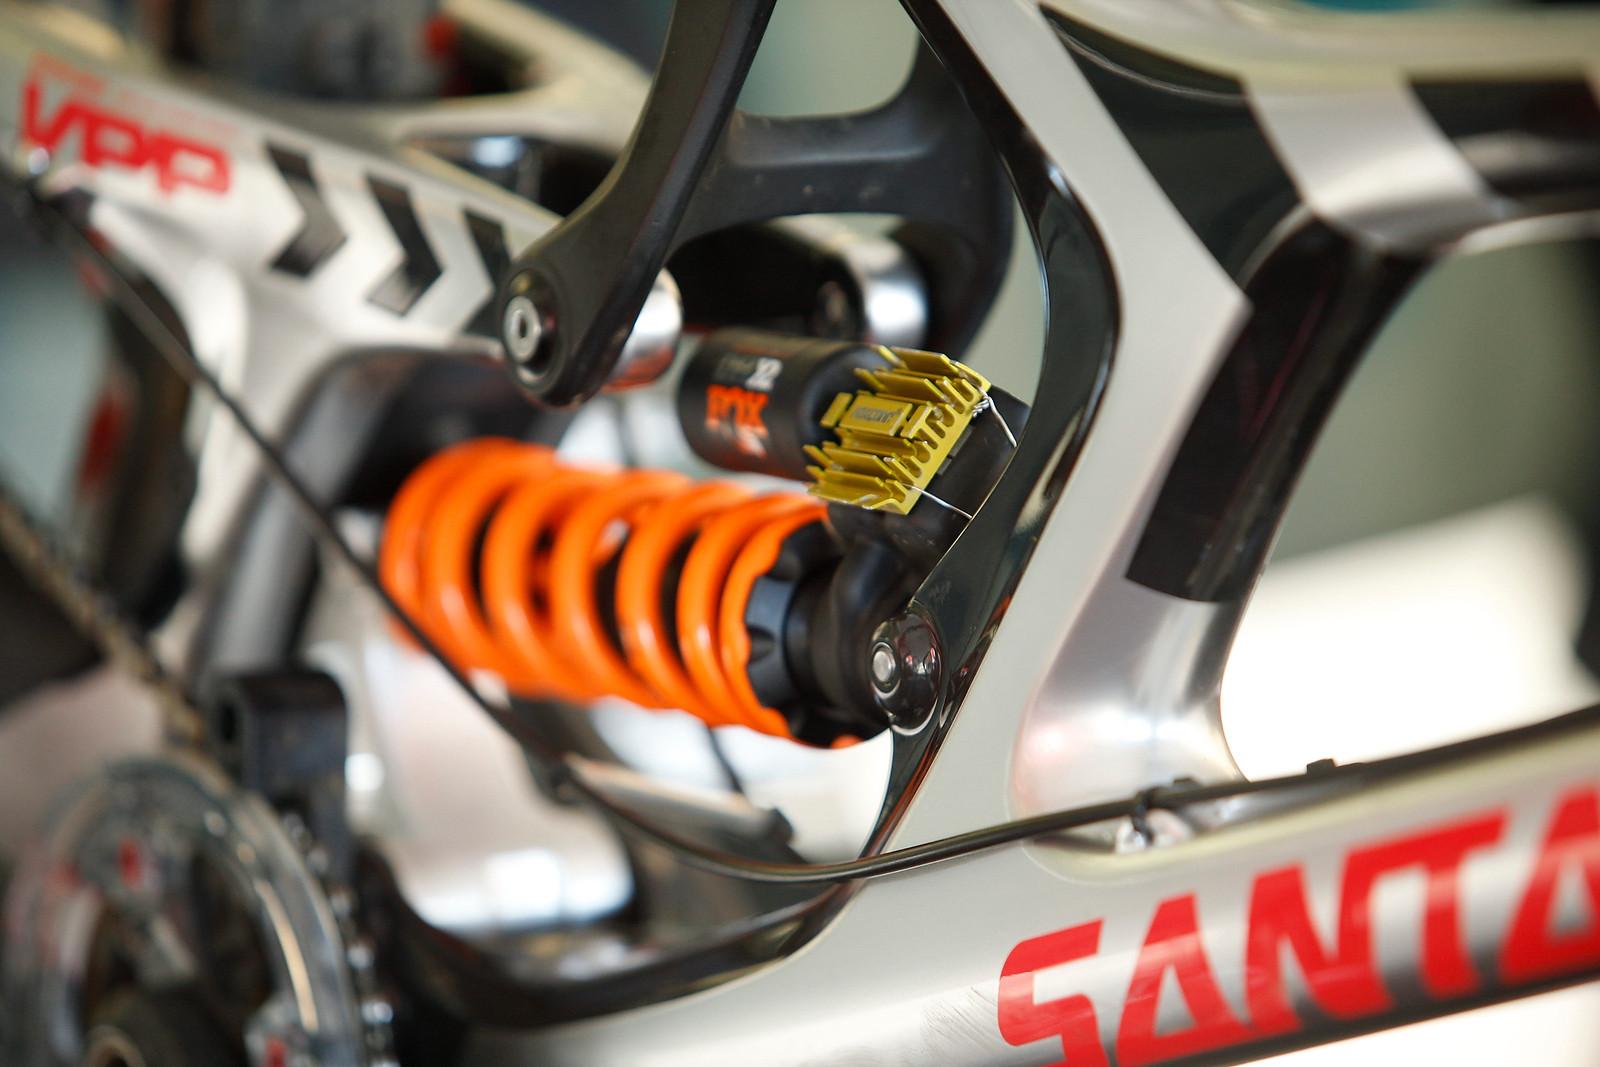 Alumimum Radiator Cooling Fins on Greg Minnaar's FOX DHX2 - PIT BITS - Mont Sainte Anne World Cup - Mountain Biking Pictures - Vital MTB